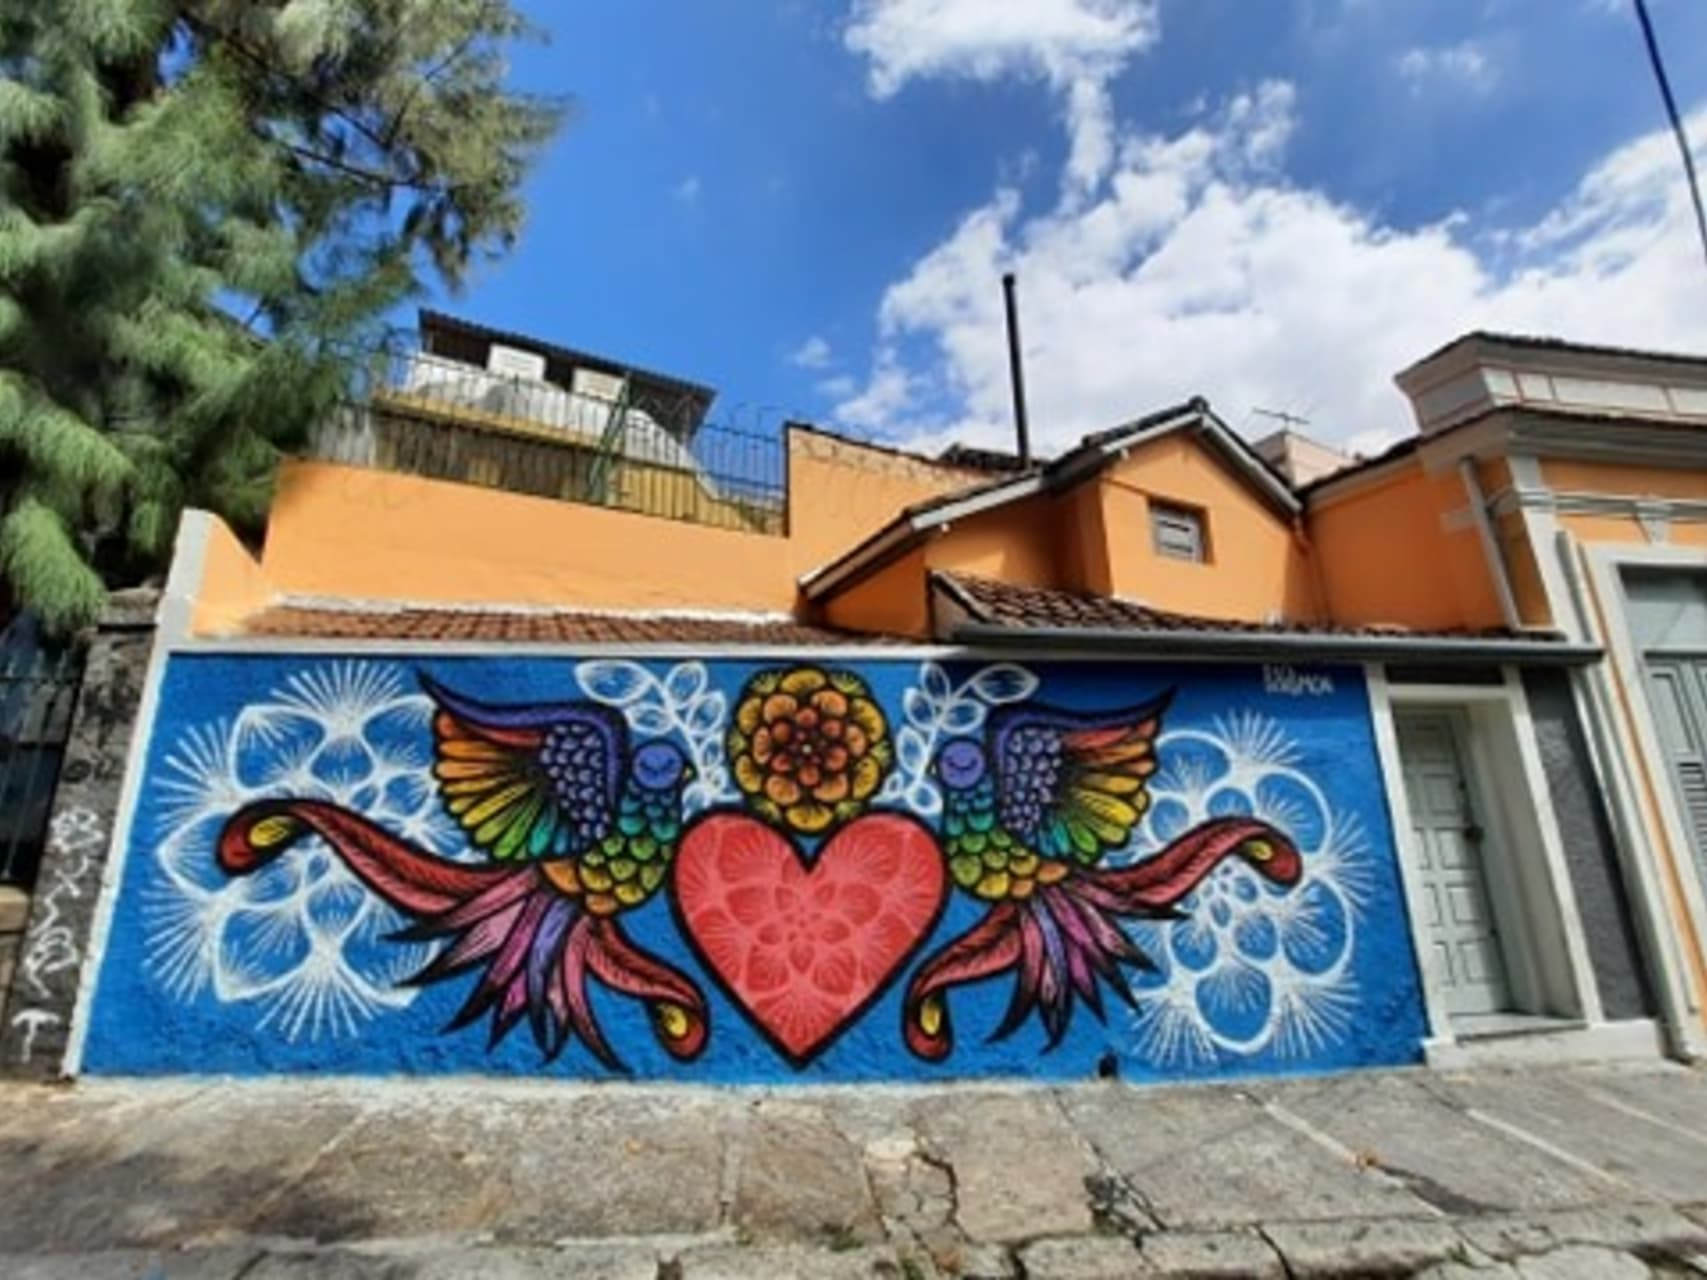 Rio de Janeiro - Street Art in Rio's Most Charming Neighborhood: Santa Teresa!